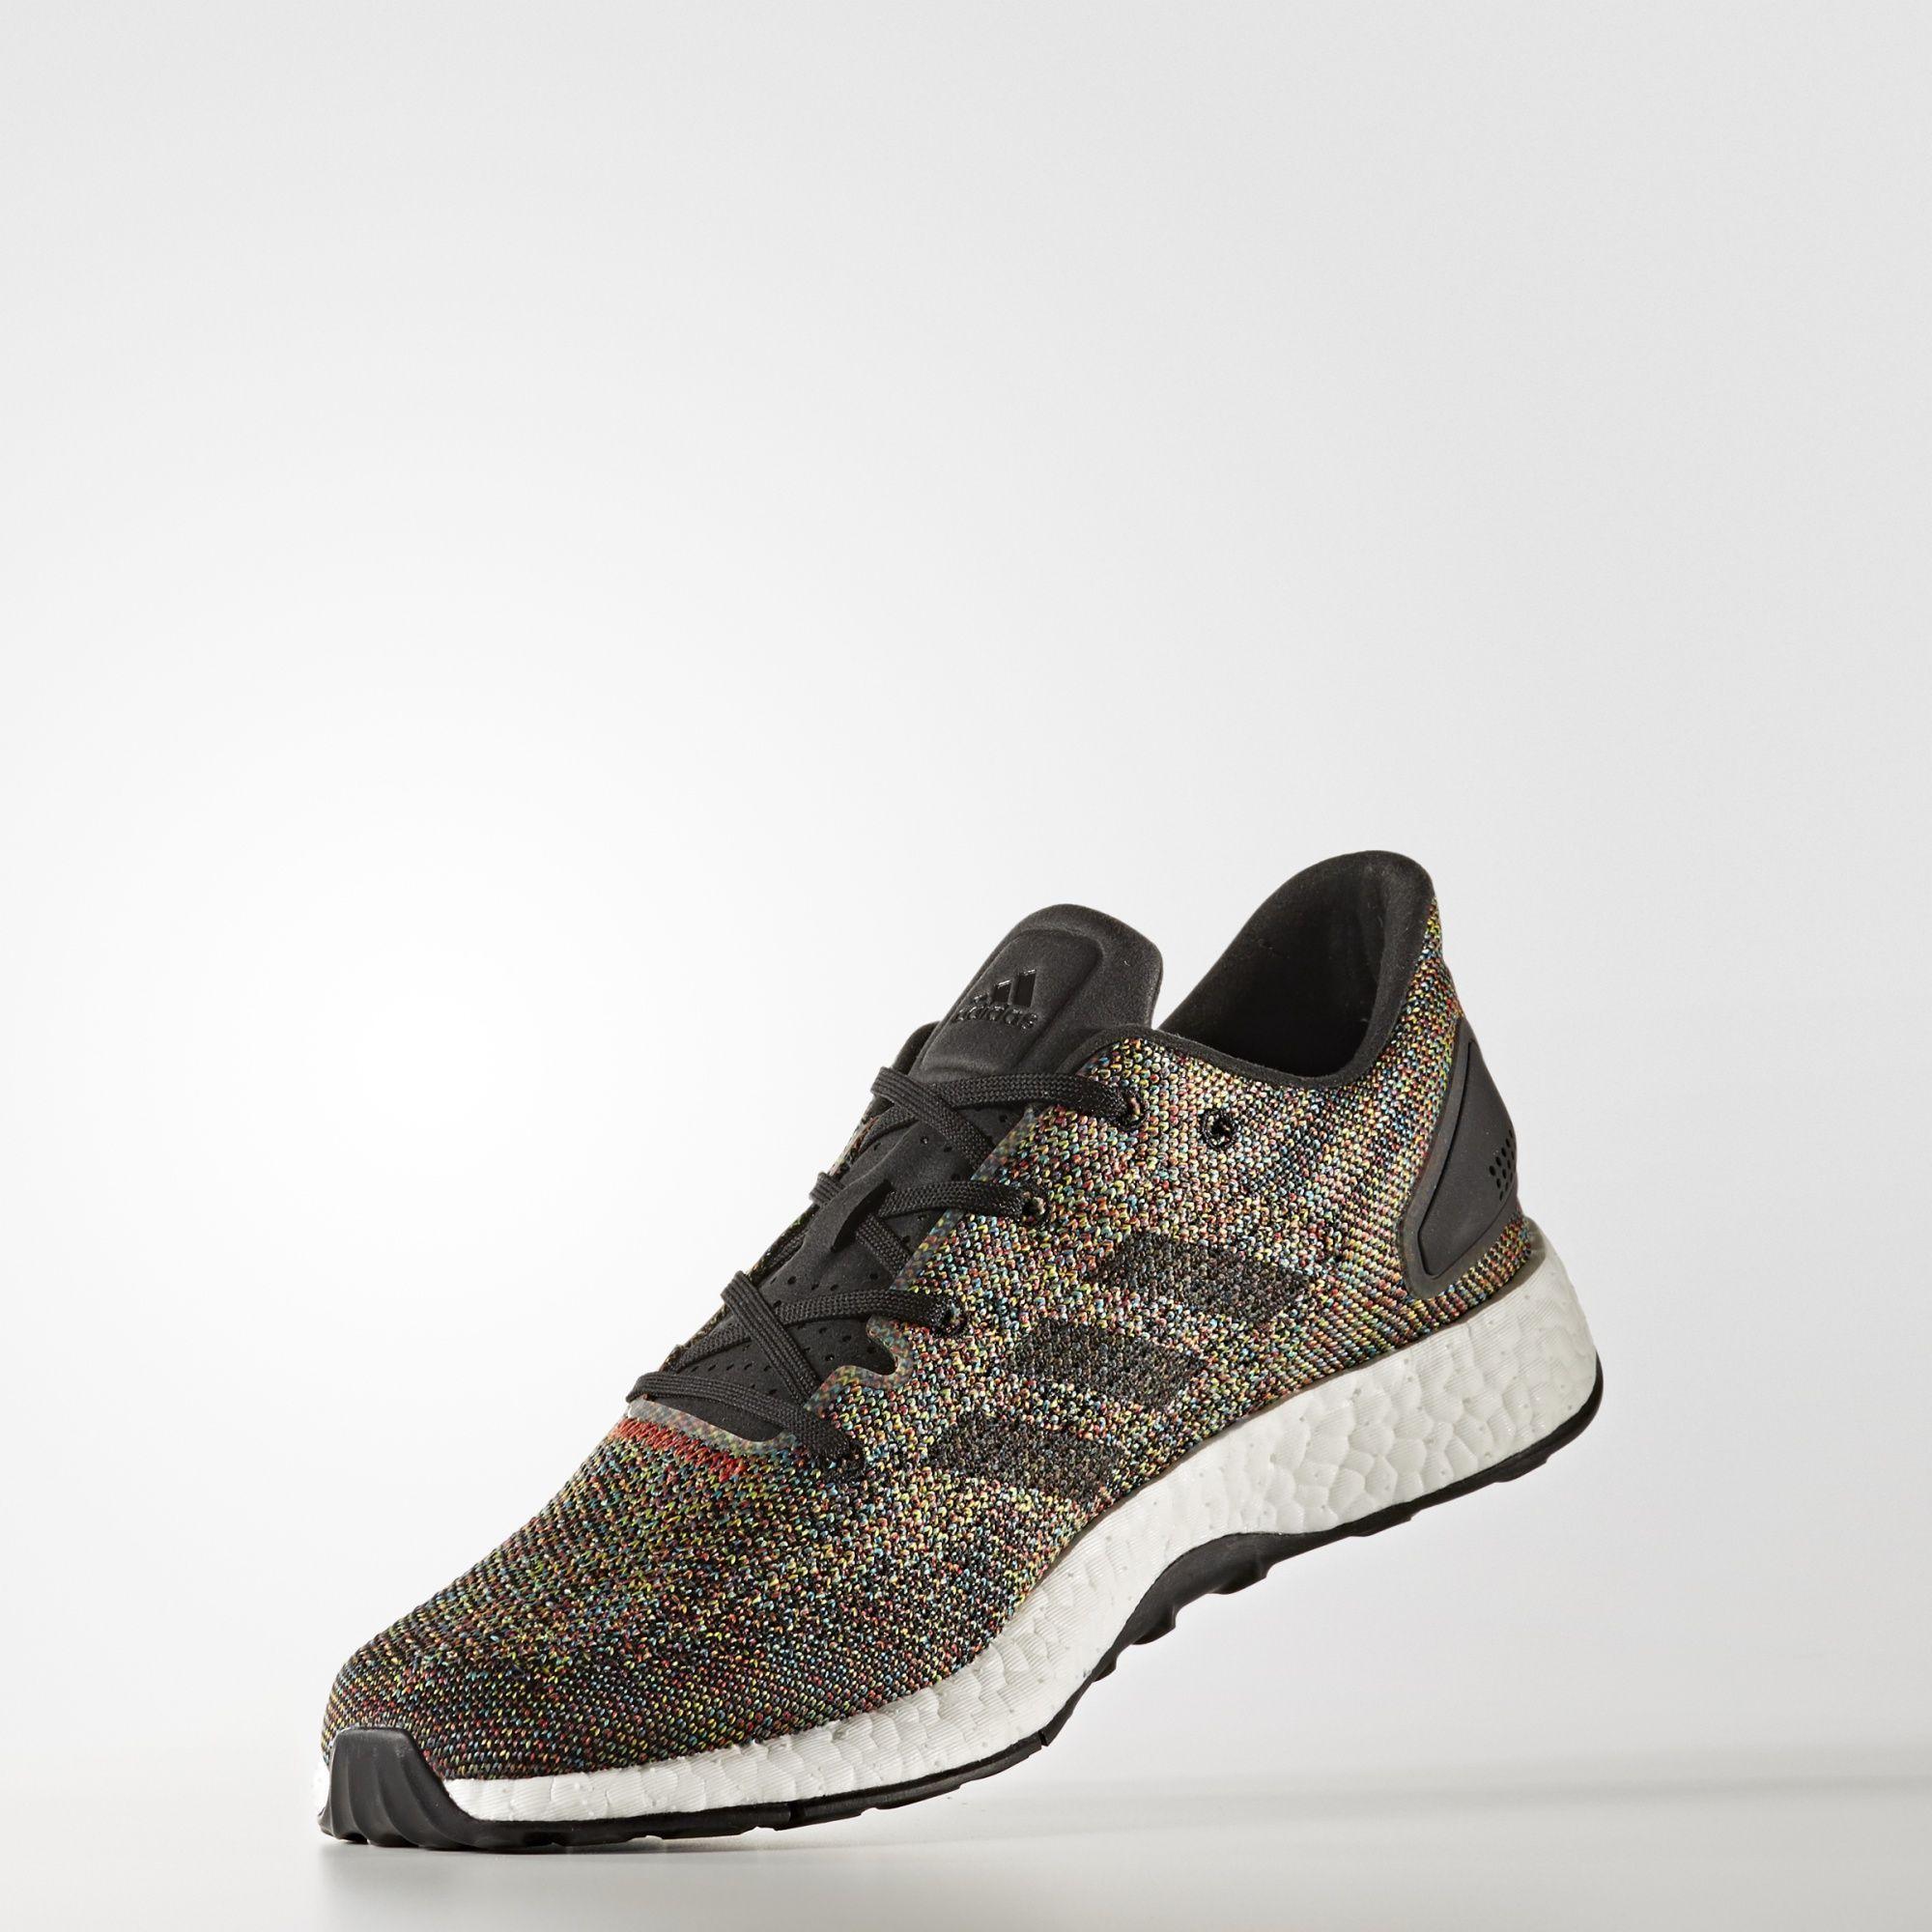 Moda Zapatos Deportivos Adidas Performance Pureboost Core